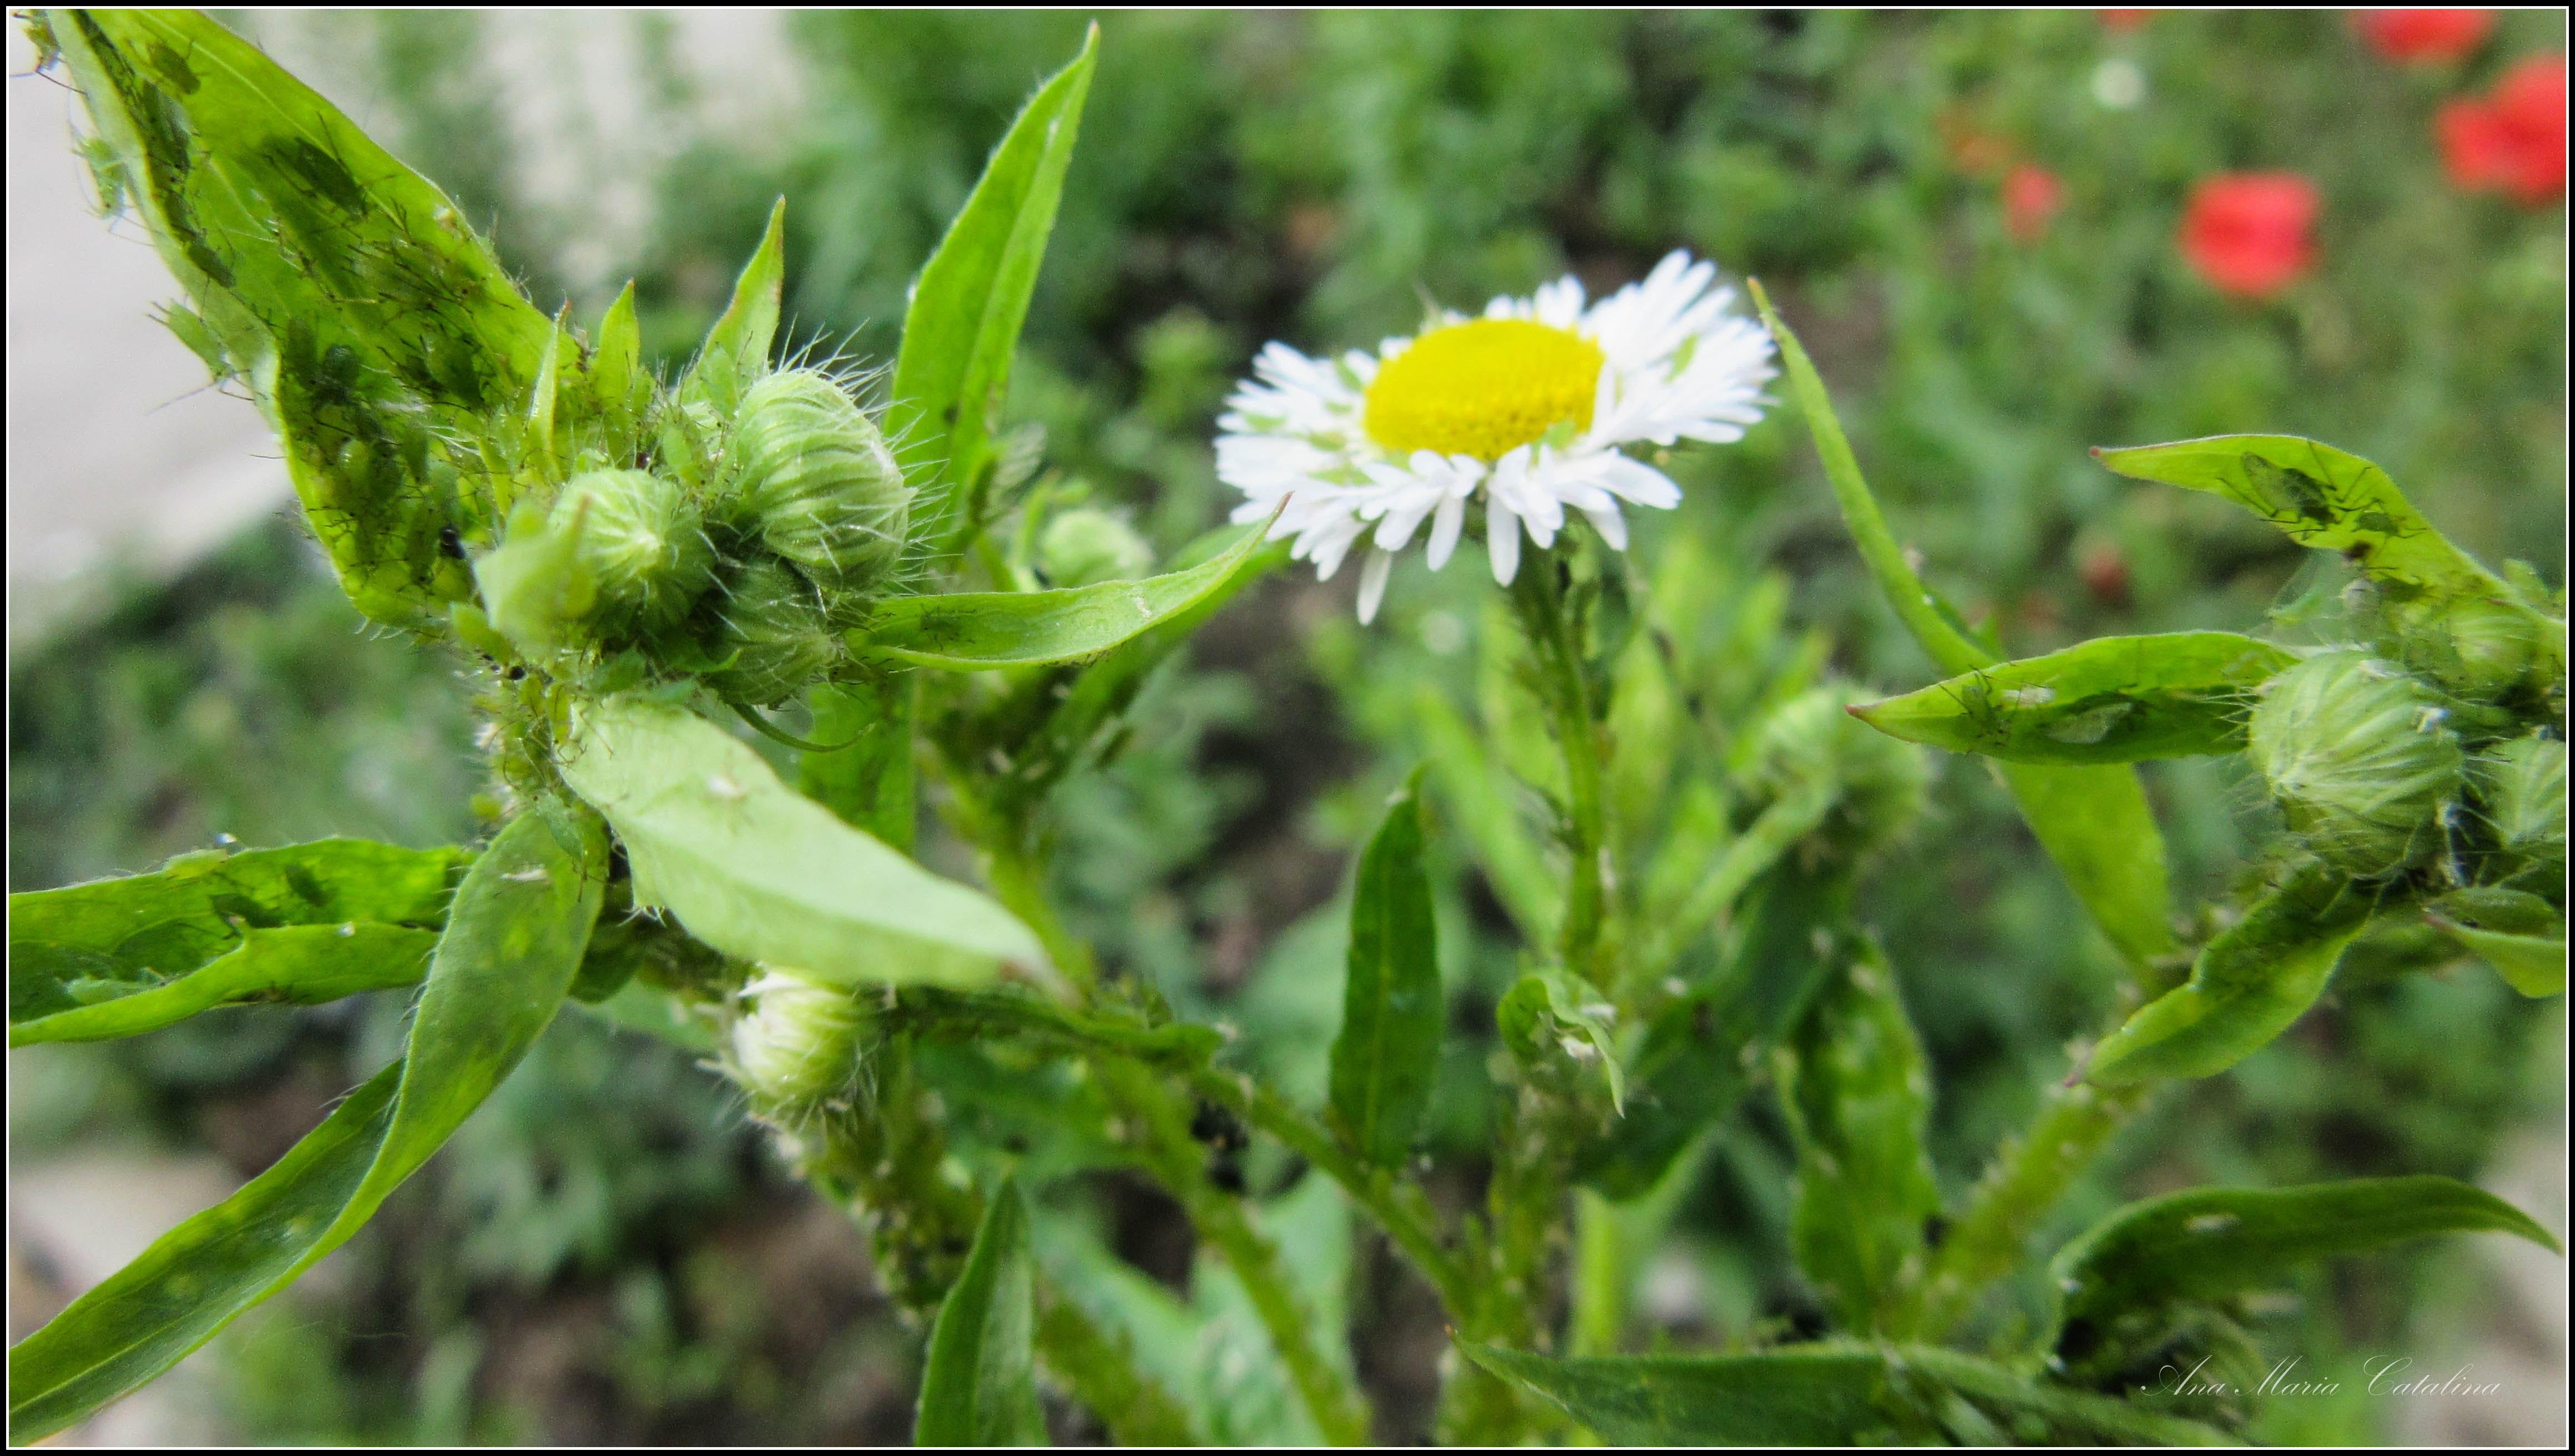 Photo: Bunghisor american - (Erigeron annuus p) - din Piata 1 Decembrie 1918 - spatiu verde - 2017.05.27 Album diverse  http://ana-maria-catalina.blogspot.ro/2017/05/plante-diverse.html